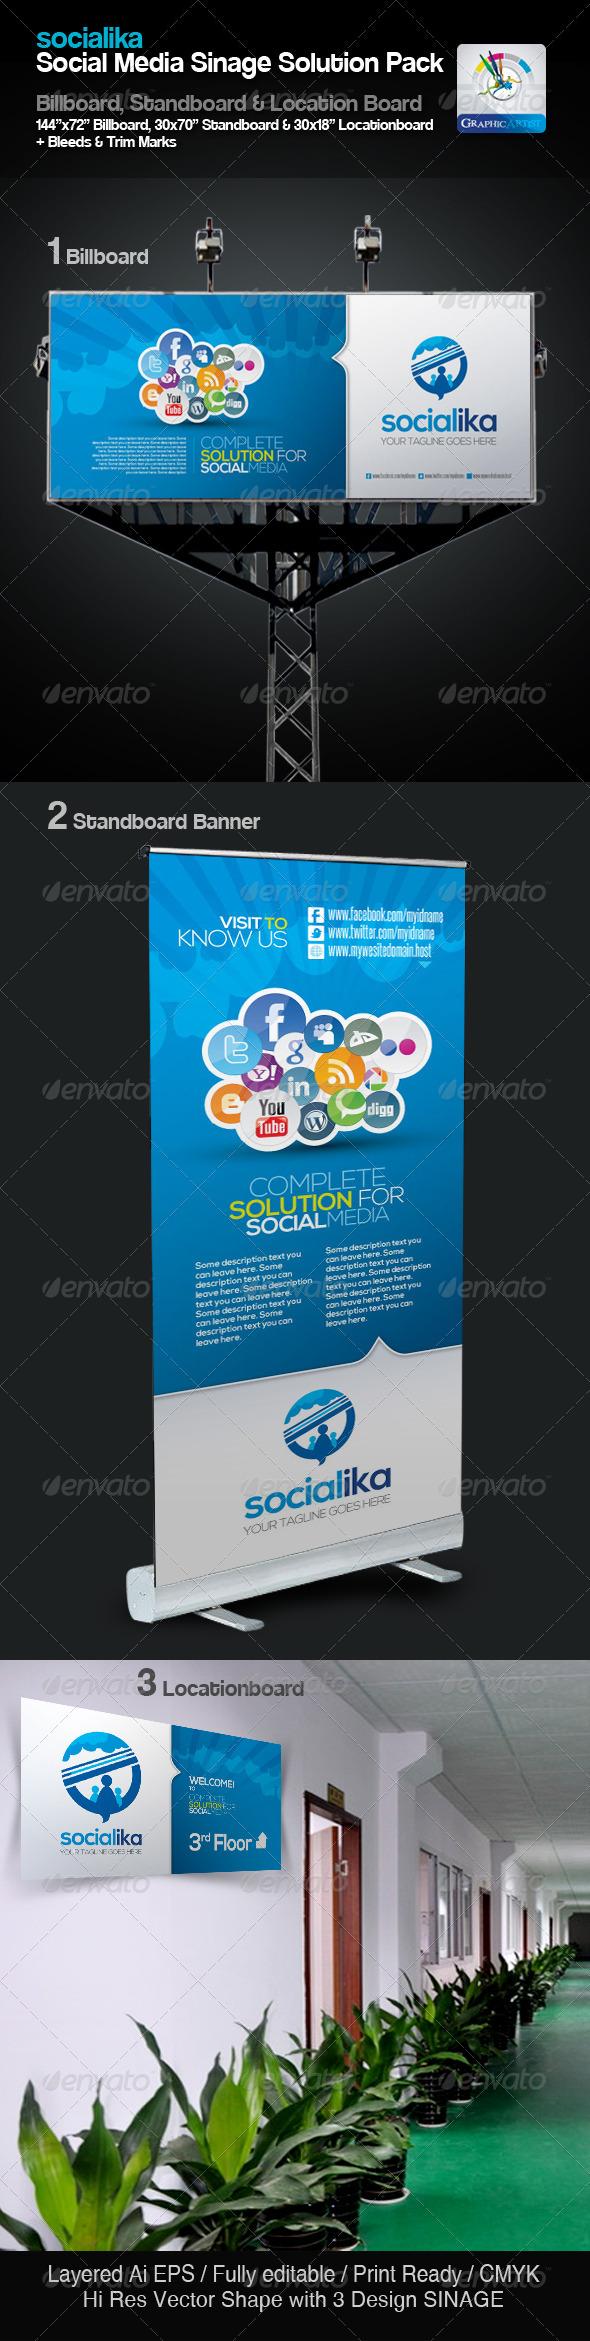 Socialika Social Media Sinage Solution Pack - Signage Print Templates